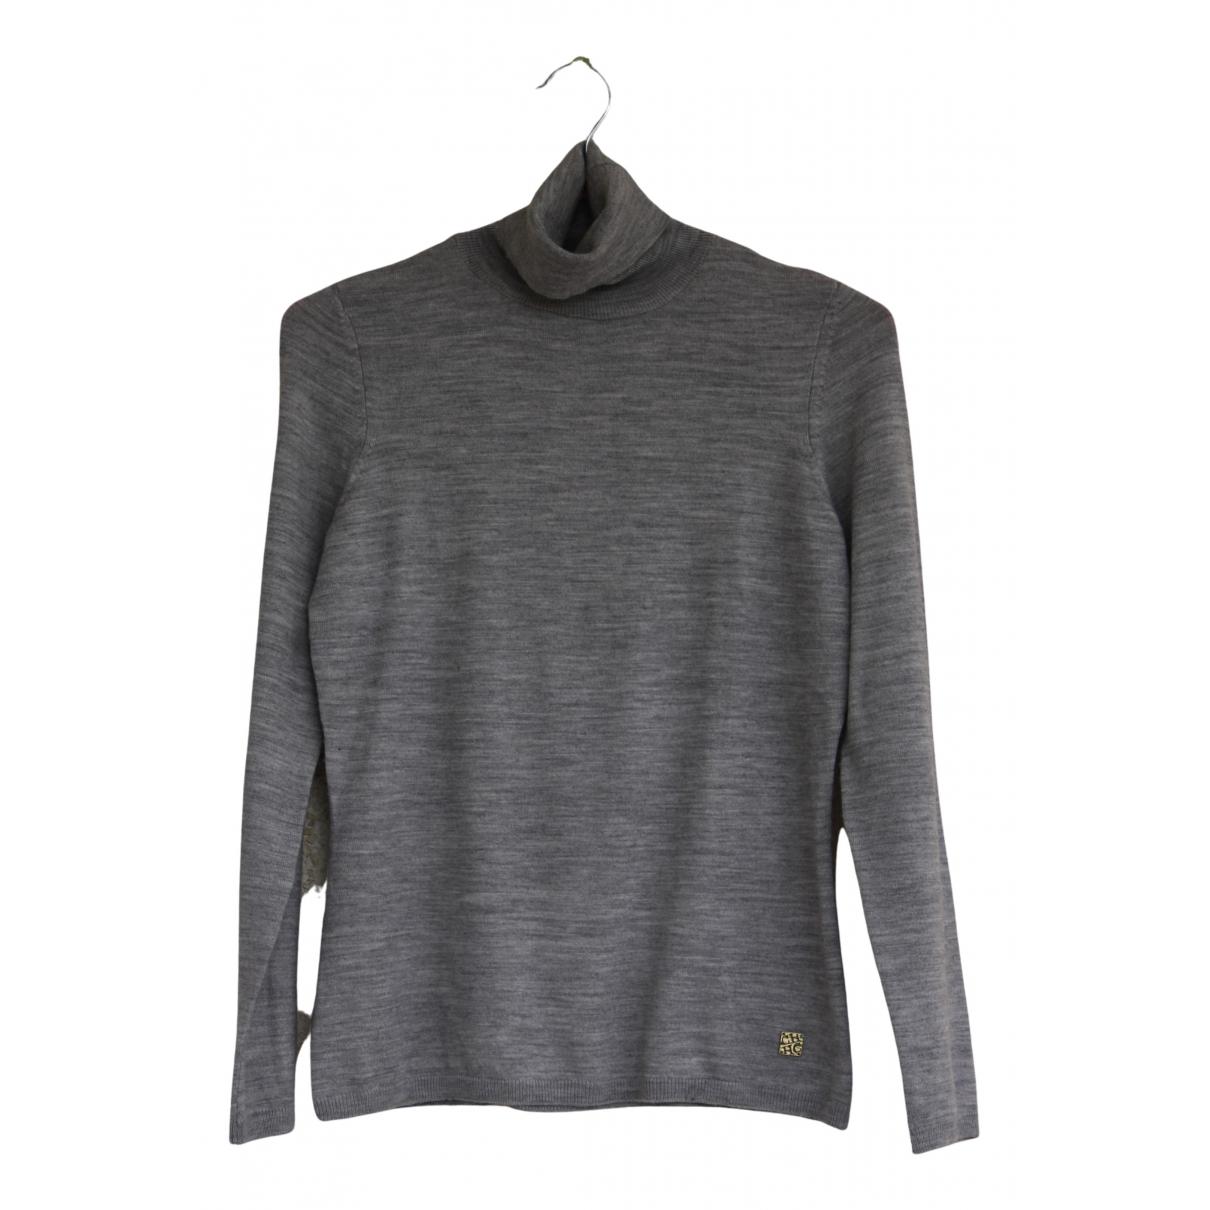 Carolina Herrera - Pull   pour femme en laine - gris